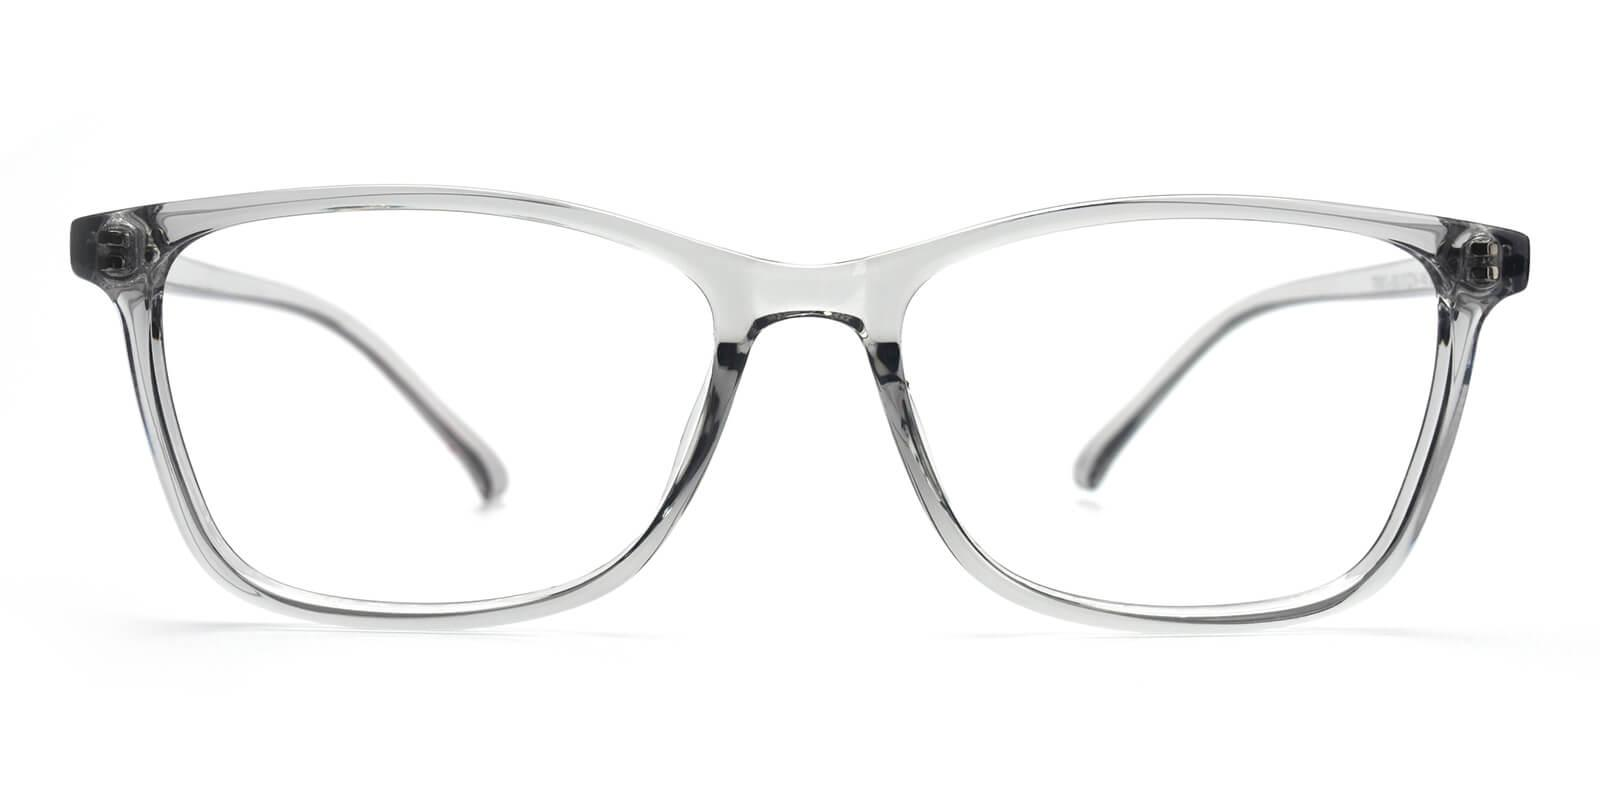 Suofia-Gray-Cat-TR-Eyeglasses-additional2